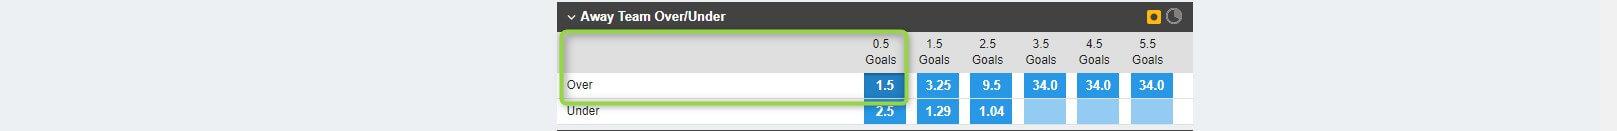 betfair same game multi over score market